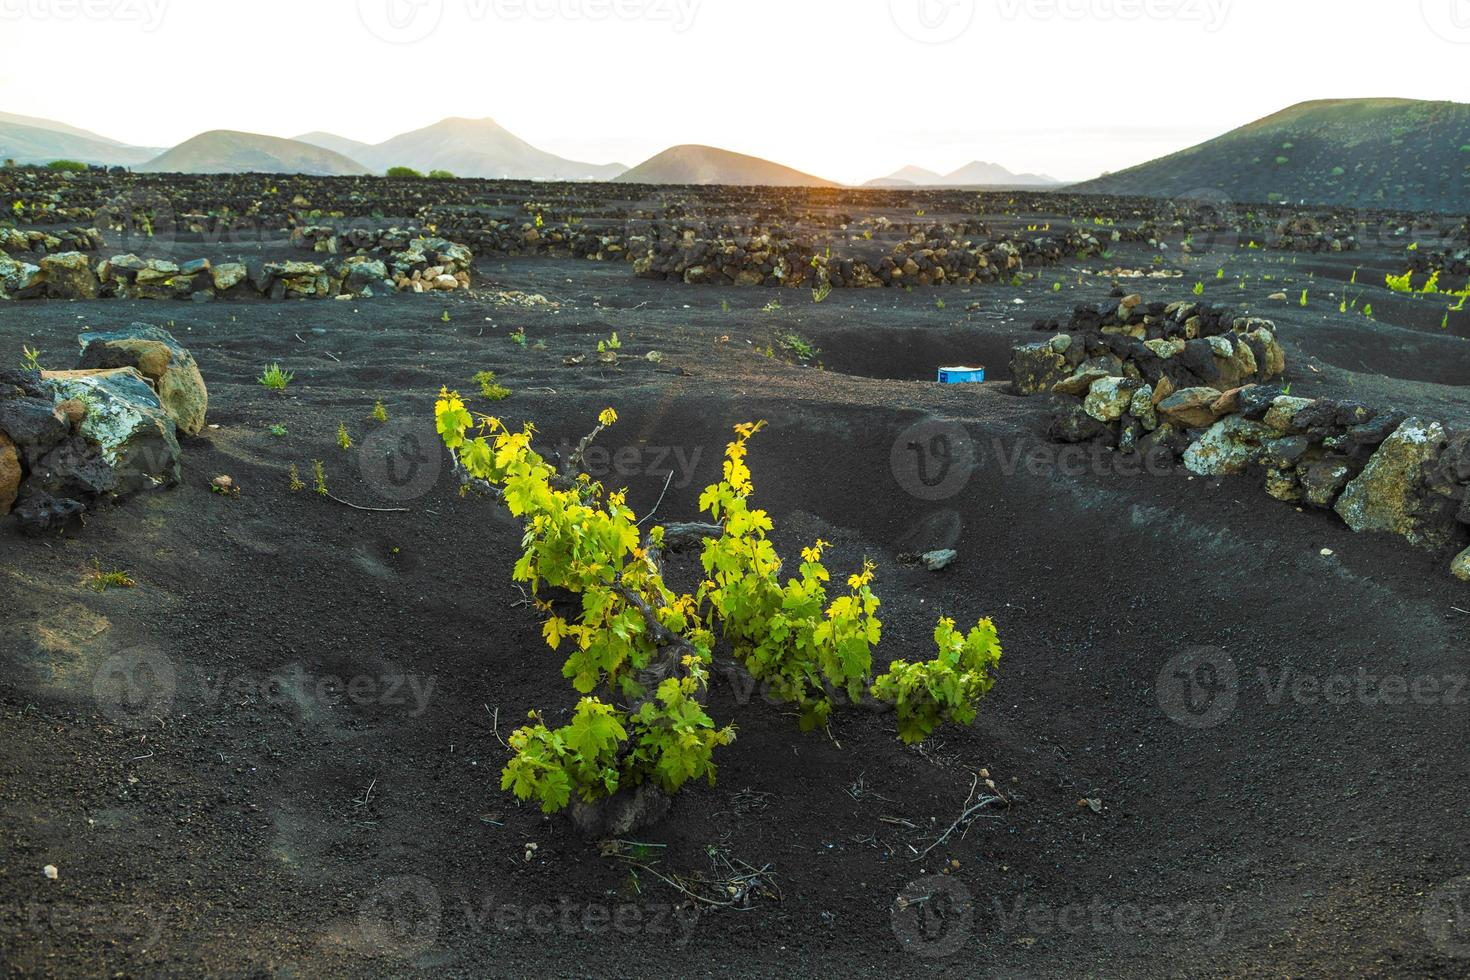 beautiful grape plants grow on volcanic soil in La Geria photo